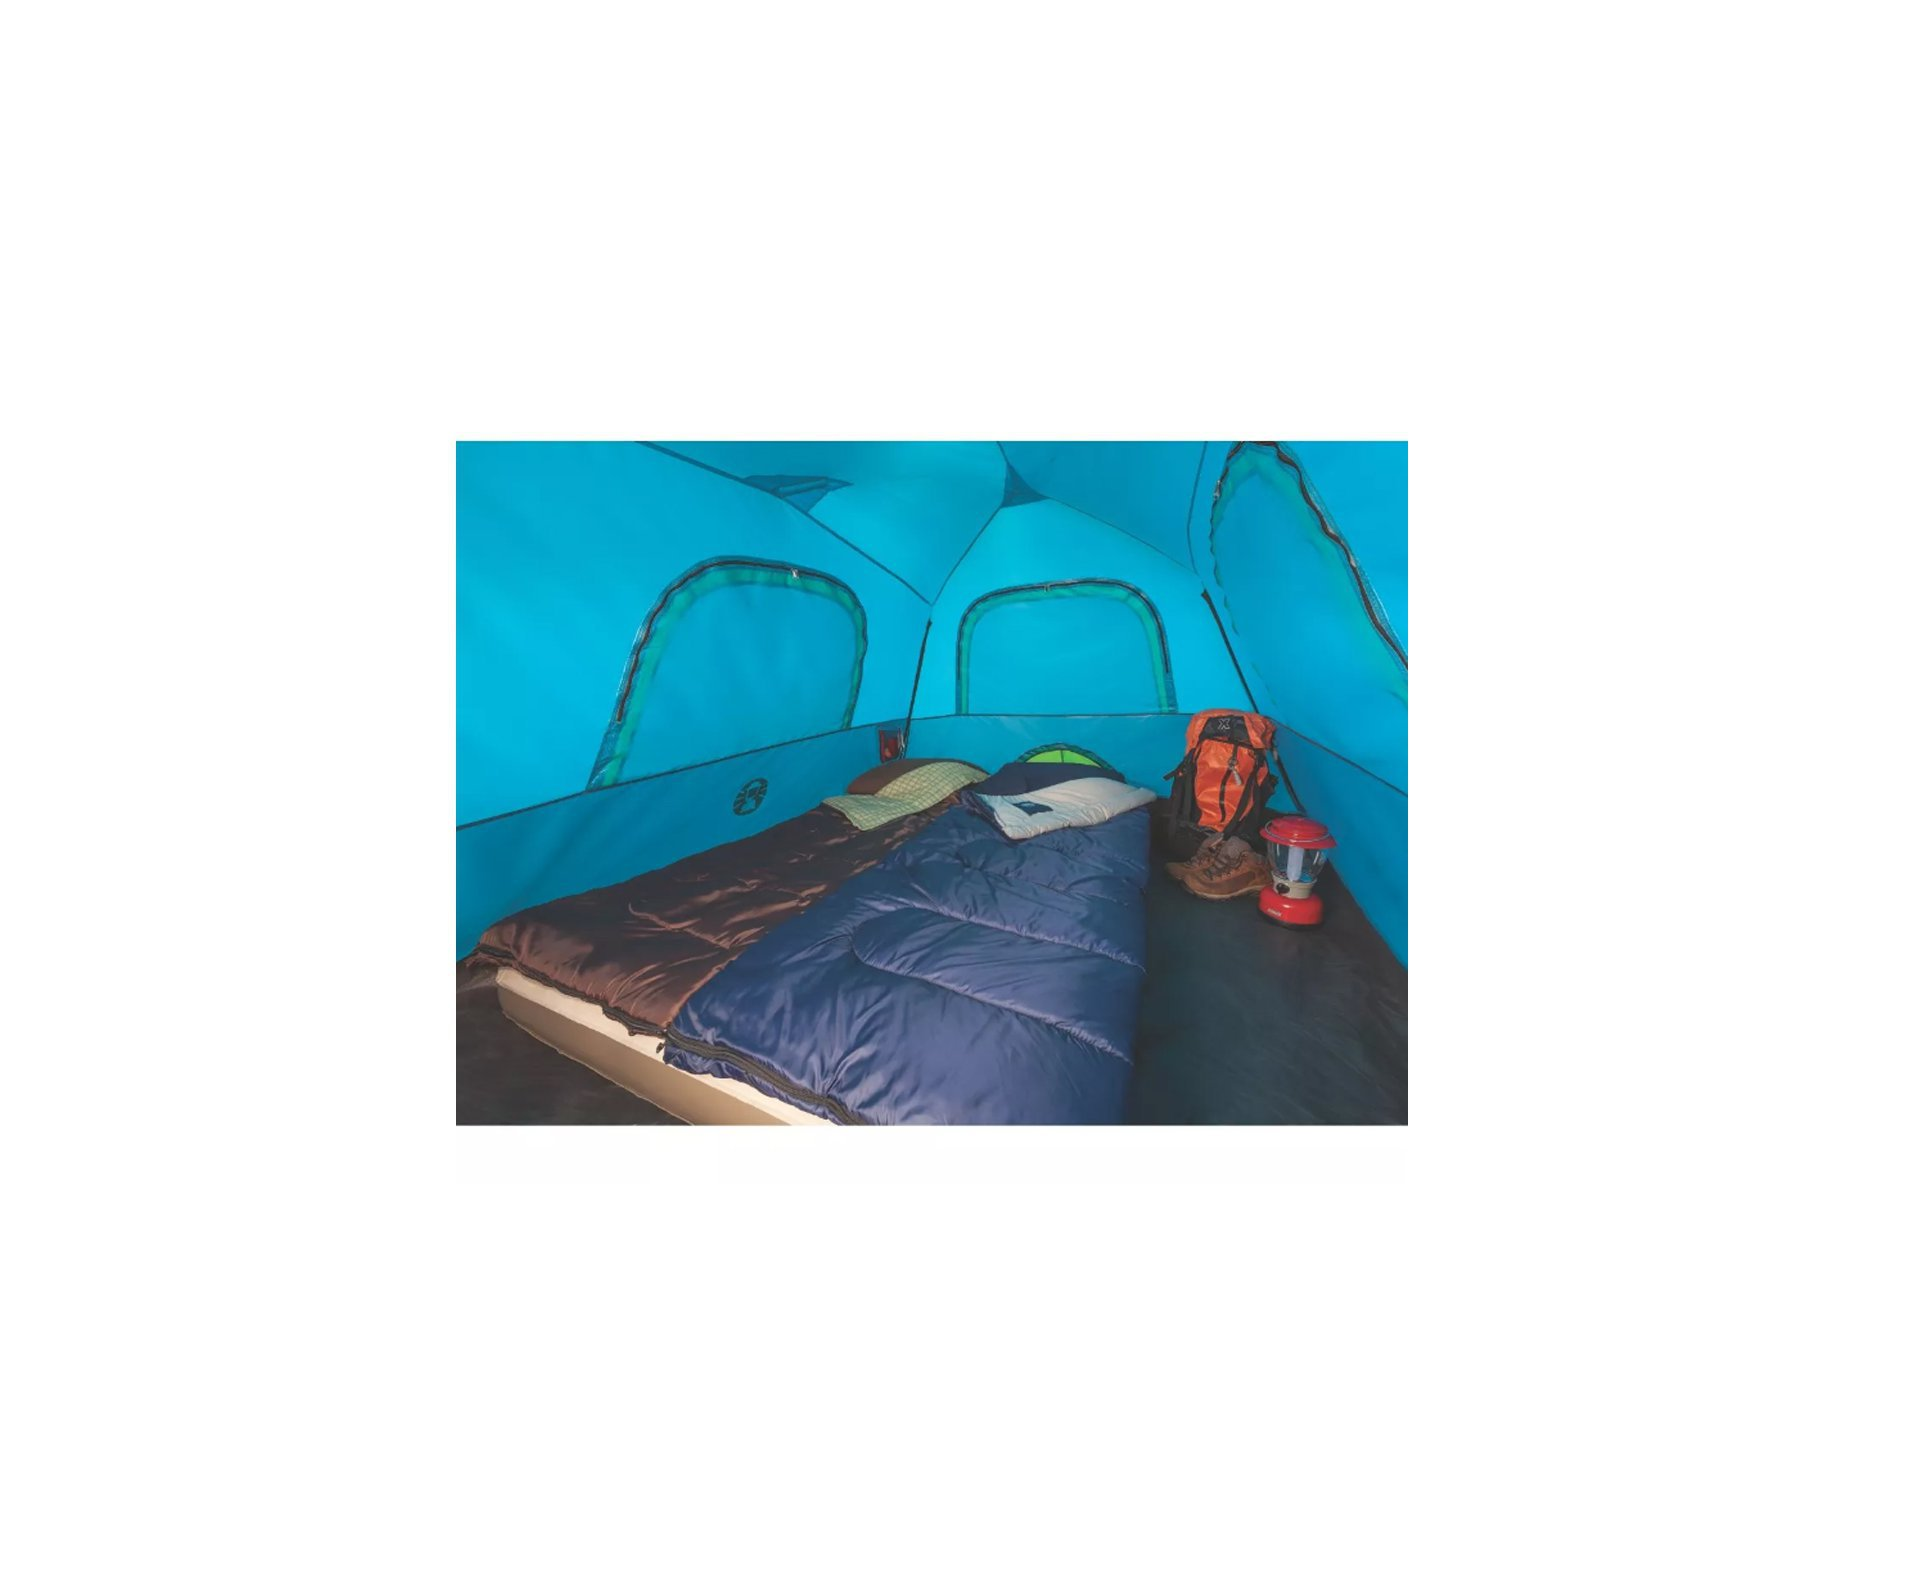 Barraca 4p Signal Mountain Instant Tent 2000mm Coluna De água  - Coleman